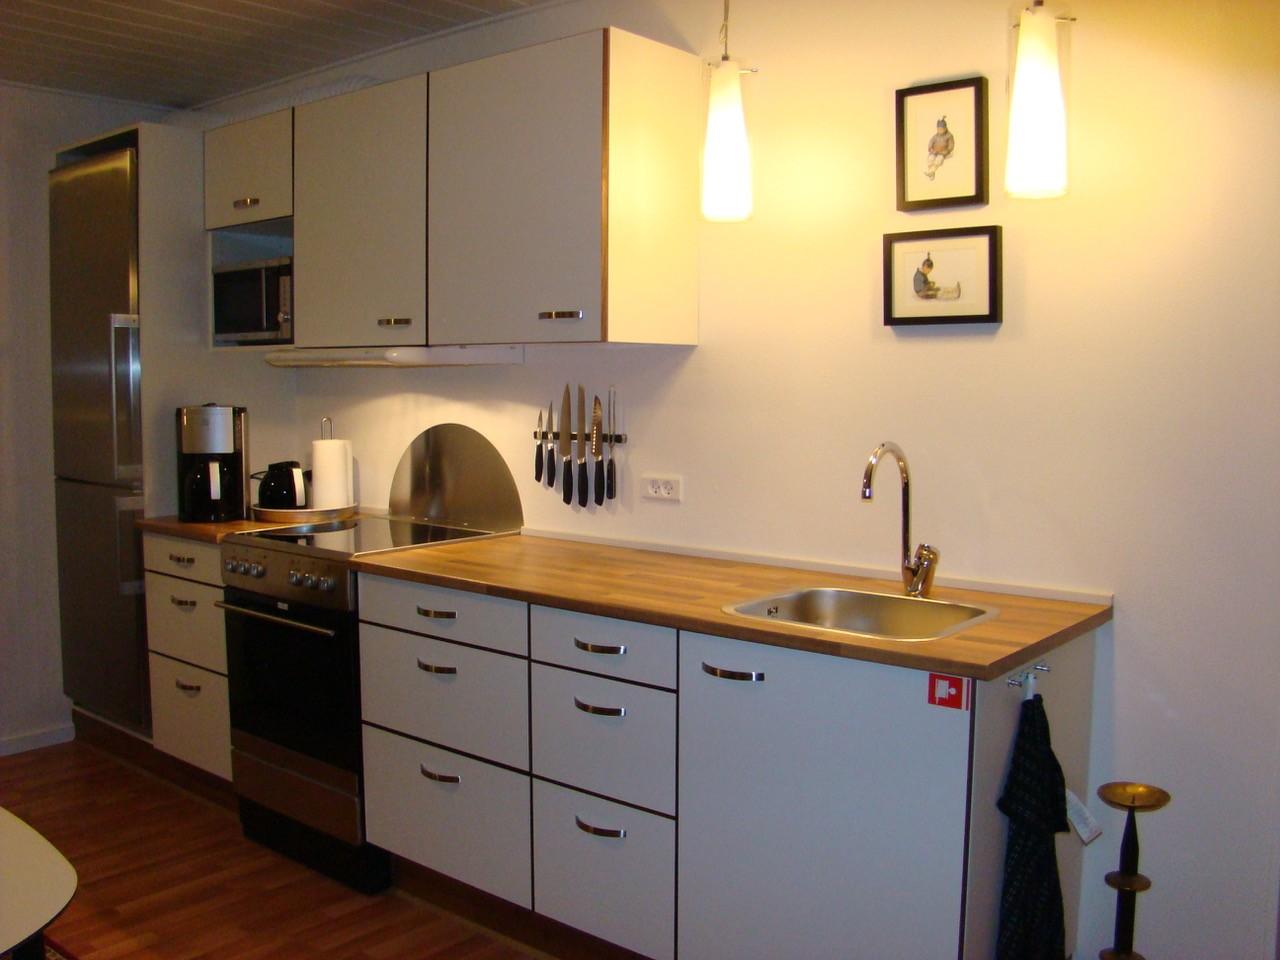 Køkken Lejlighed B + Nuuk Inn Wellness